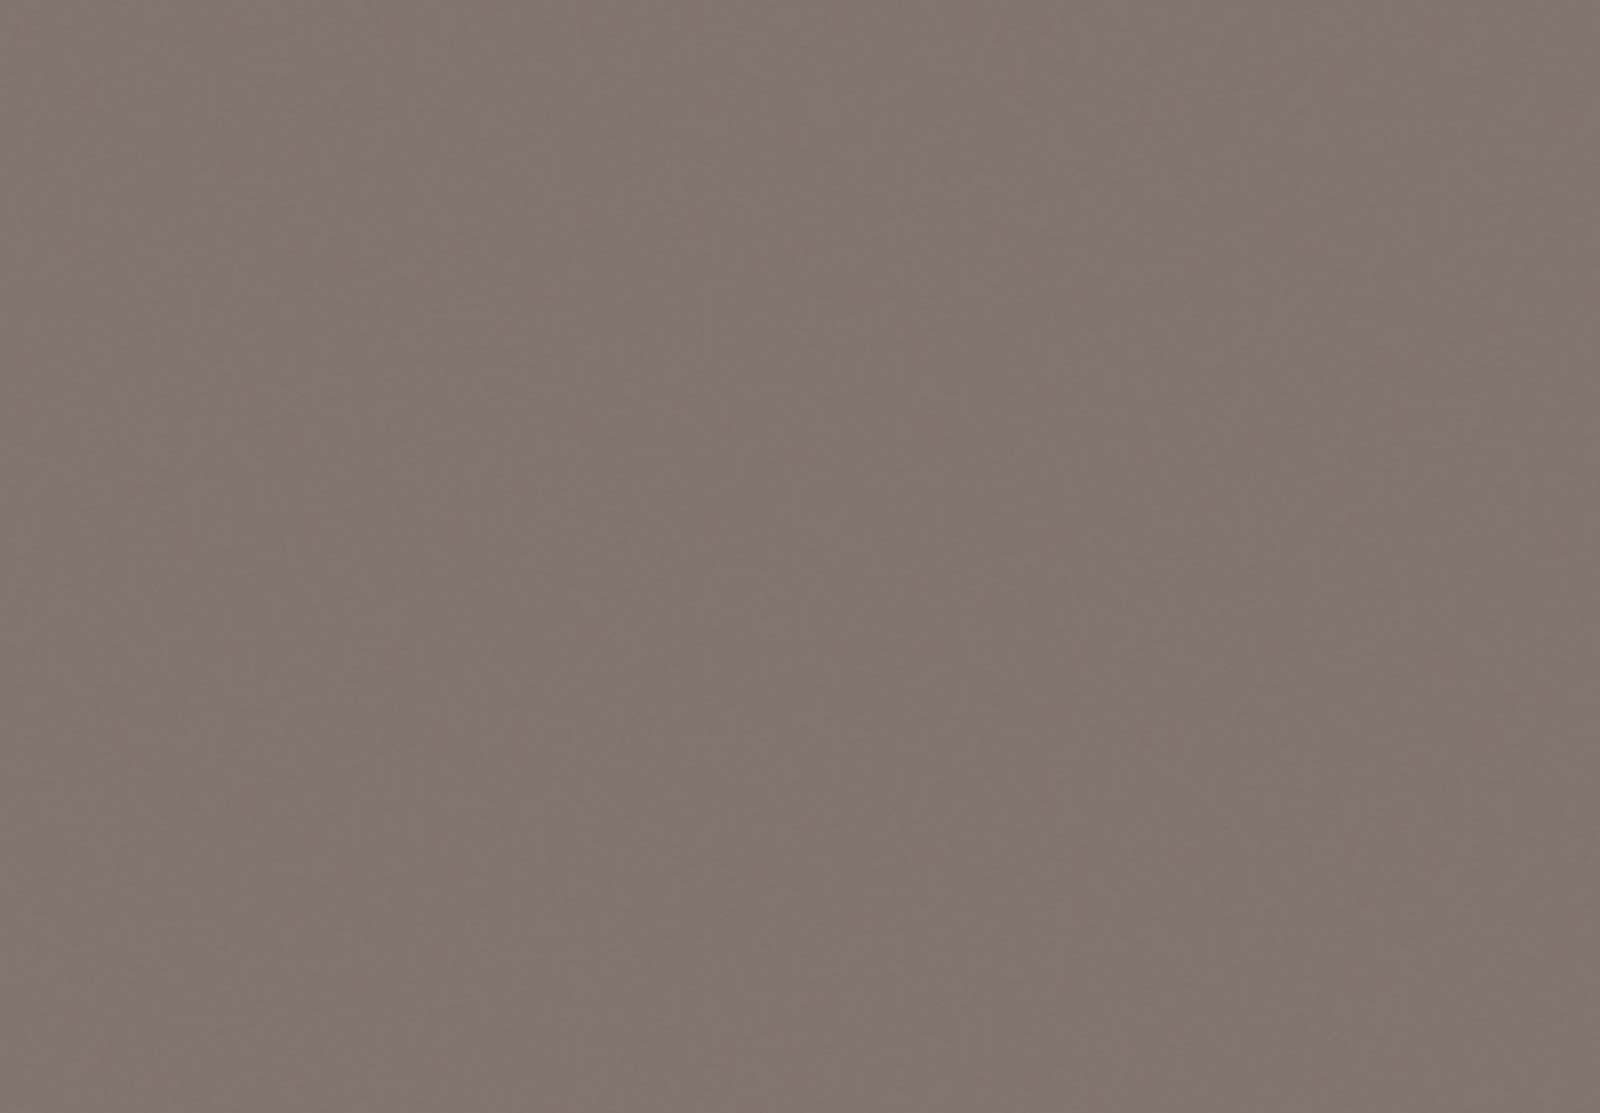 Pannelli alfawood - Cemento 0694